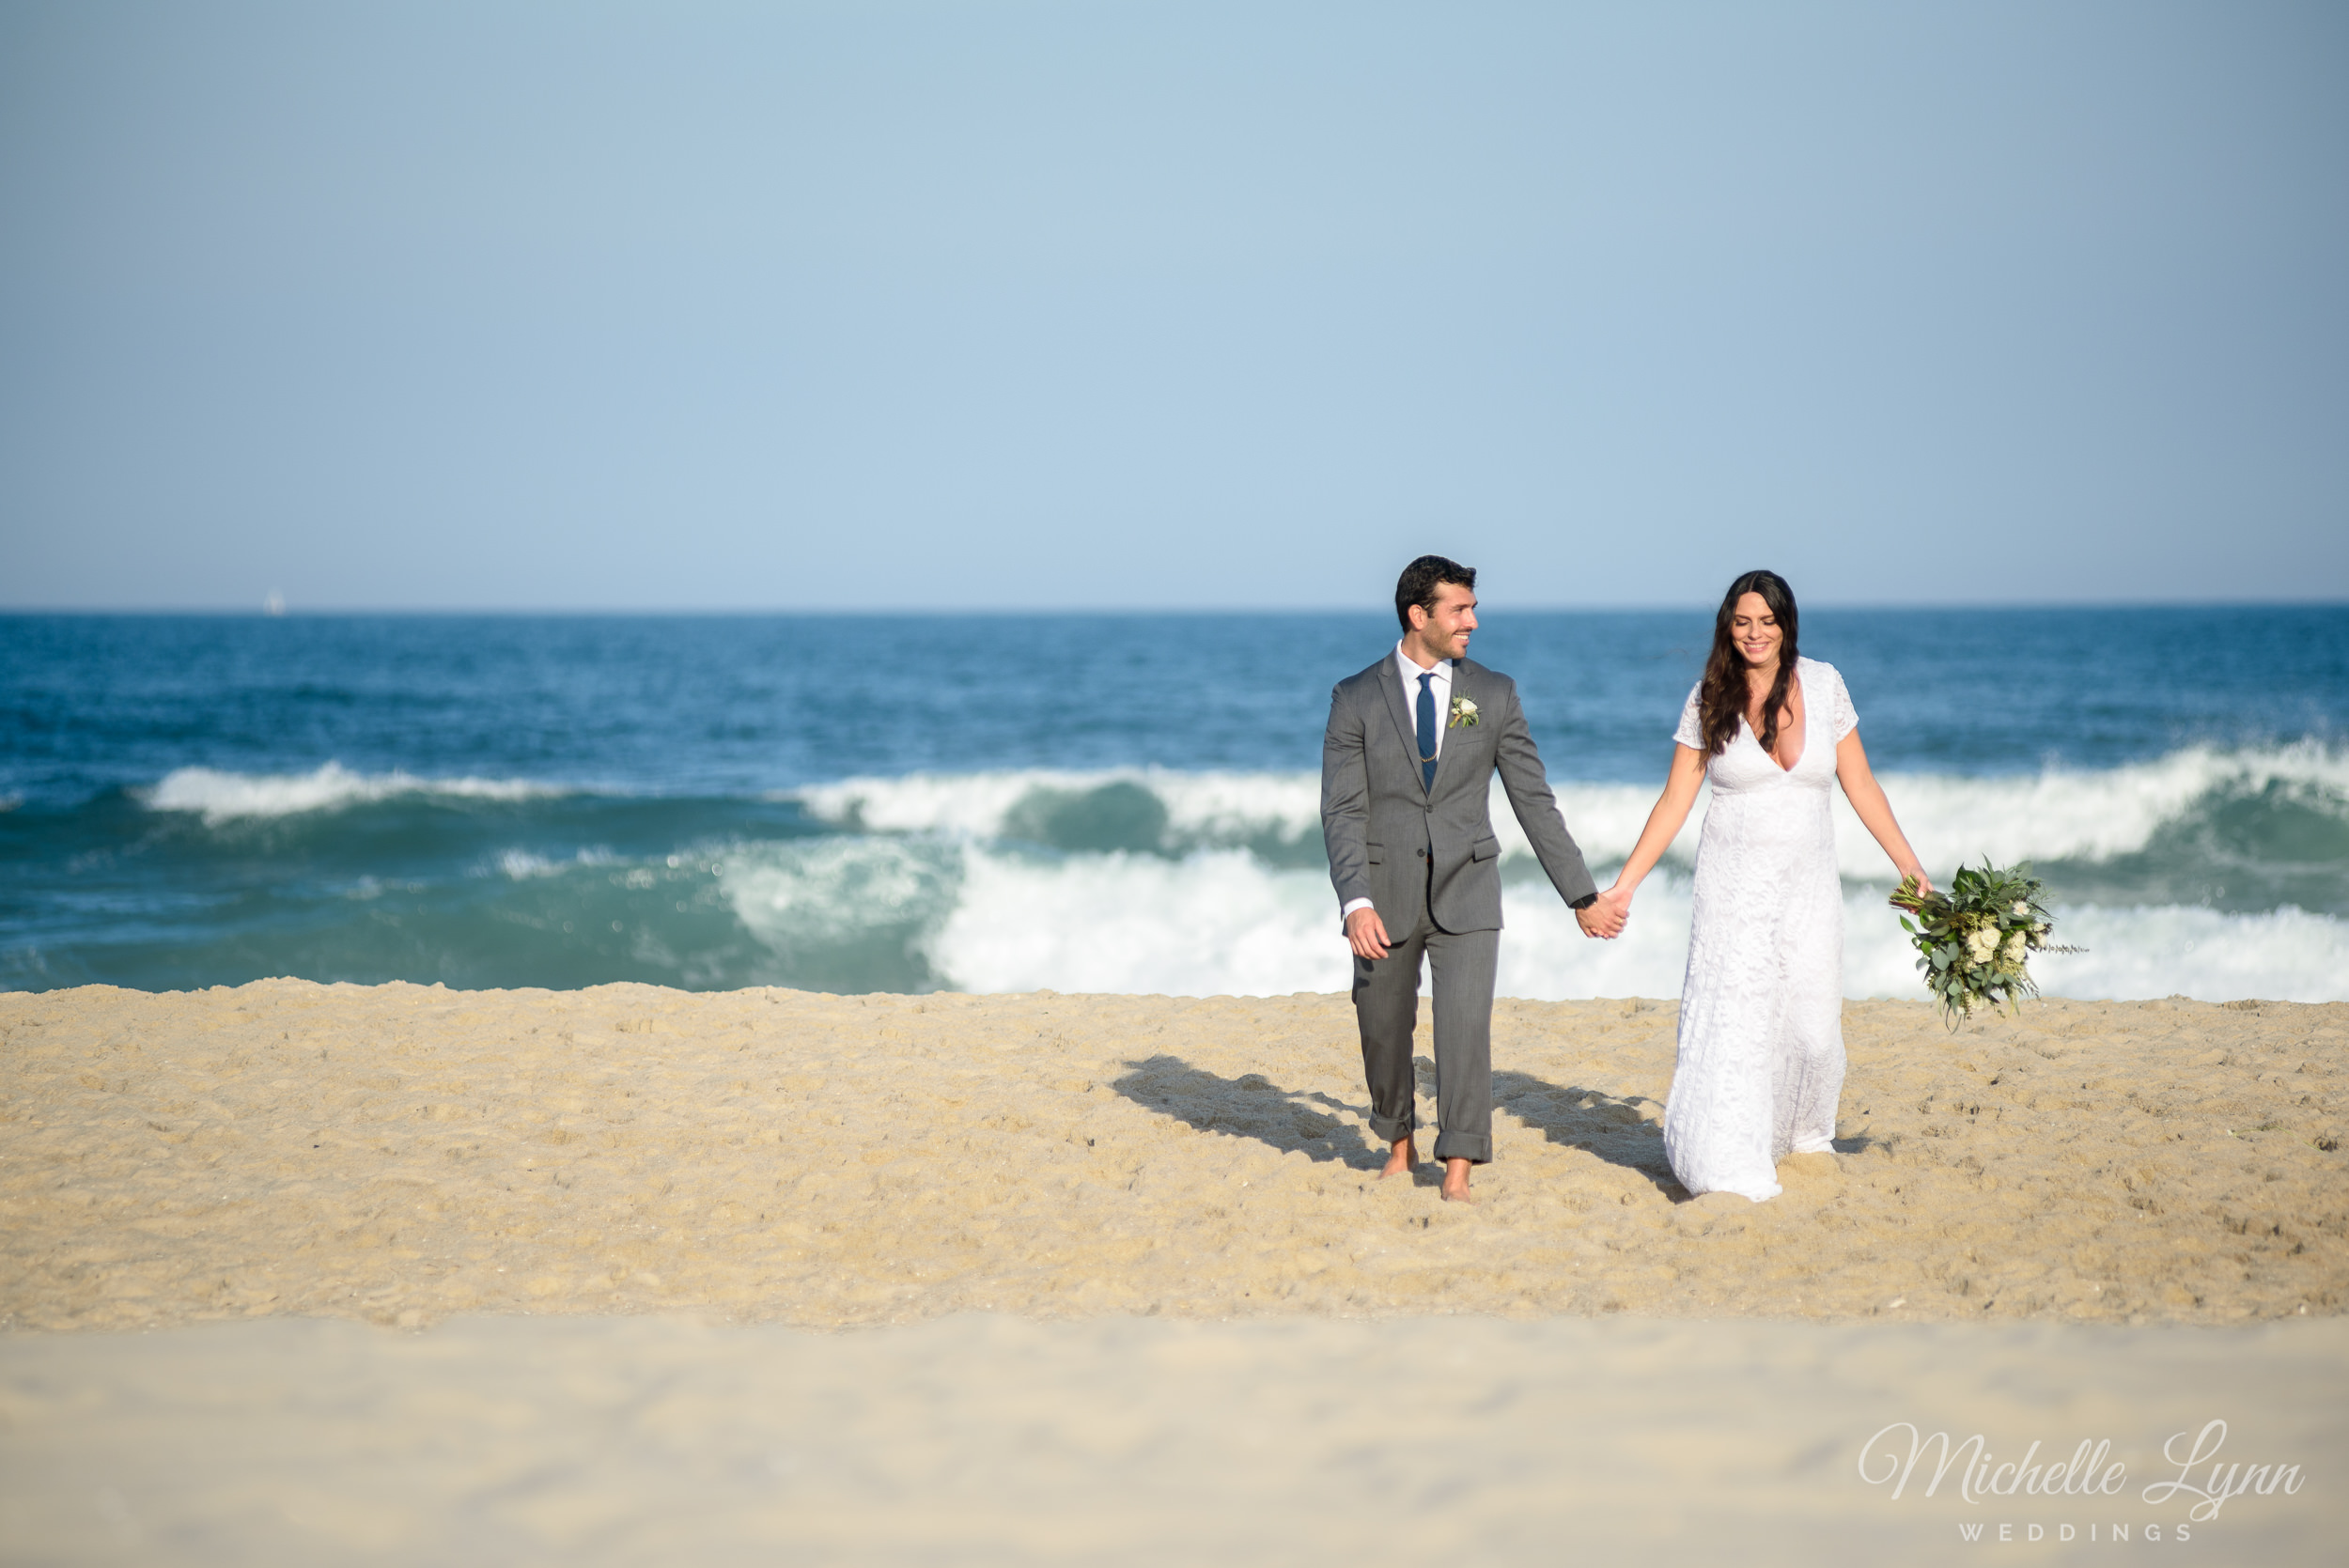 mlw-long-beach-island-new-jersey-wedding-photography-18.jpg